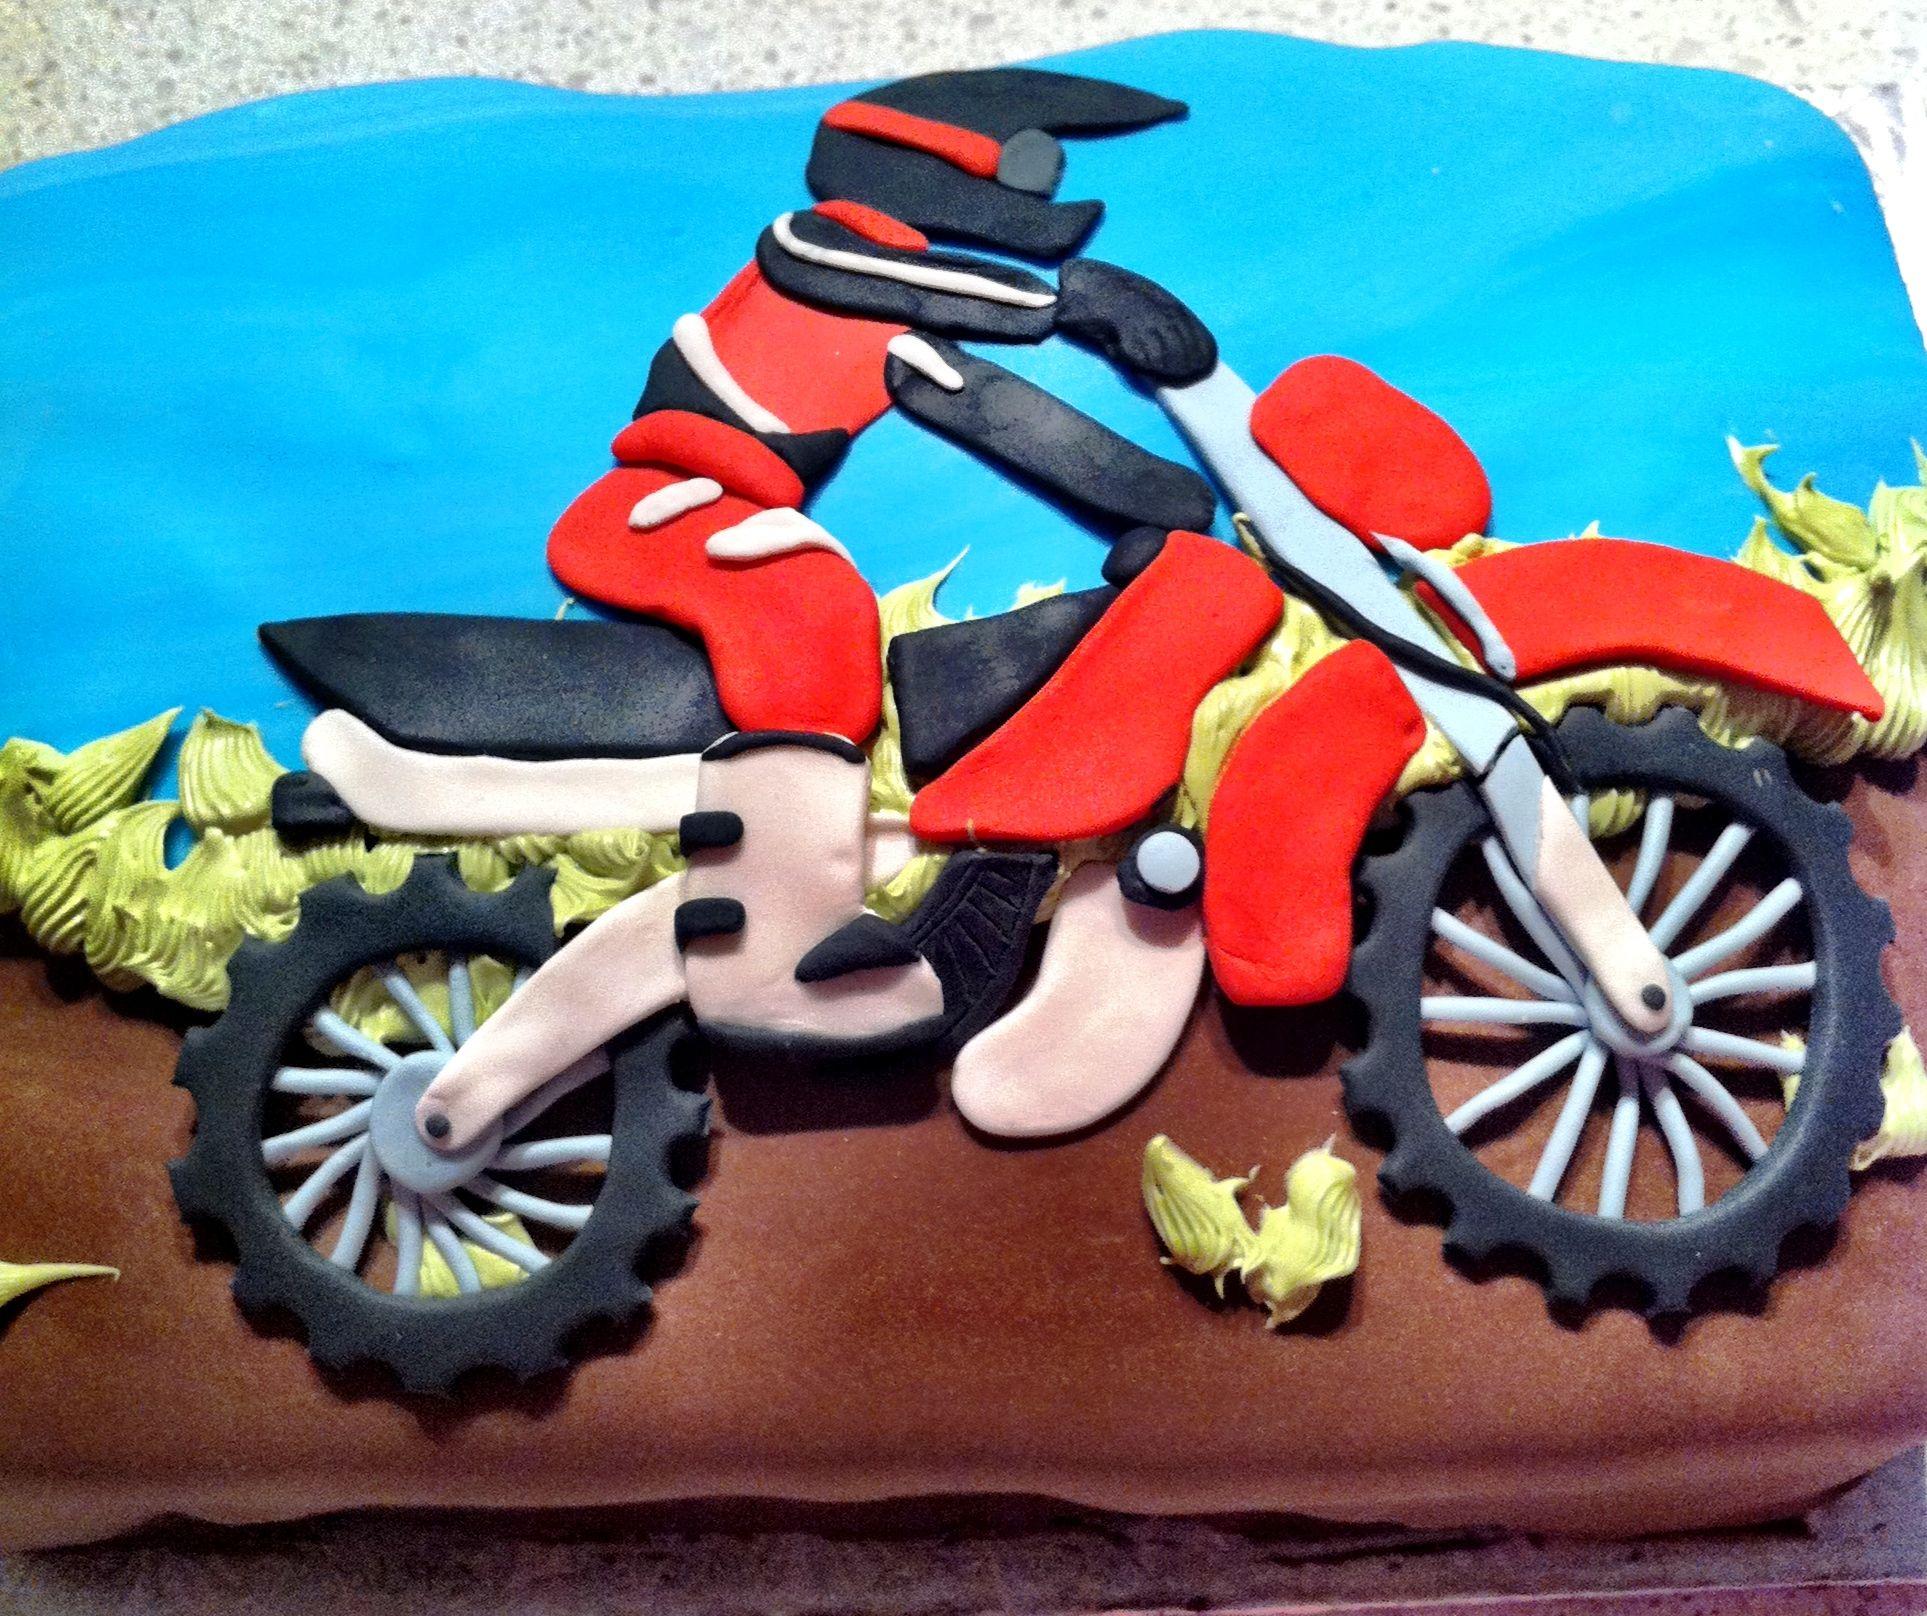 dirt bike cake - photo #45